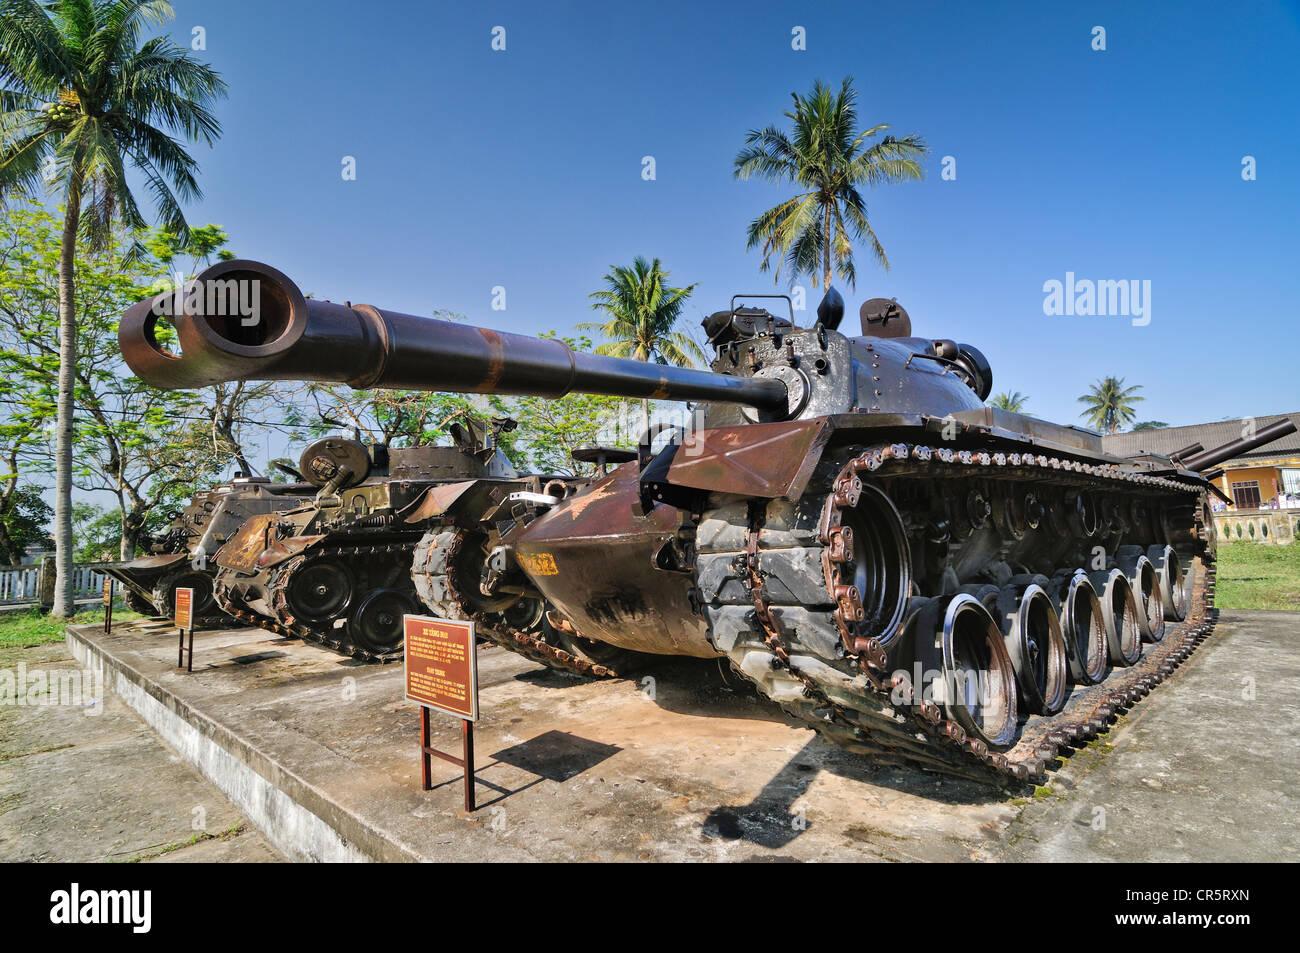 M48 tank from the Vietnam War, Vietnam Liberation Army artillery, Hue, Vietnam, Asia - Stock Image